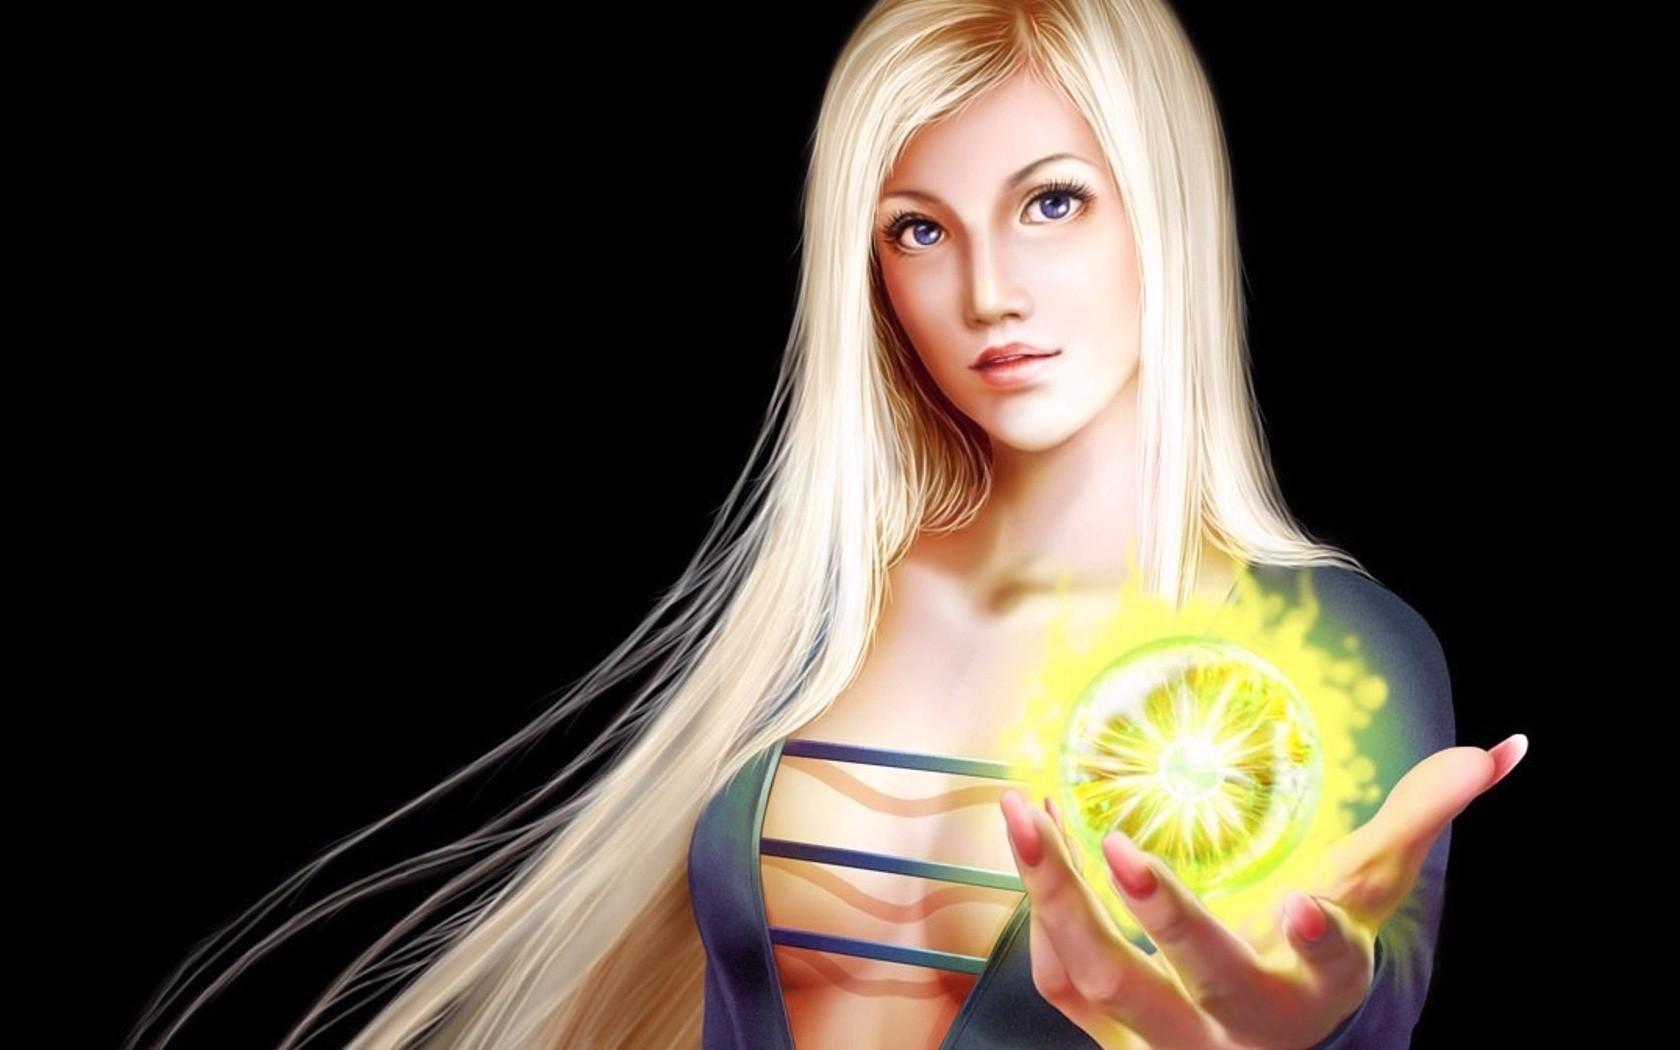 General 1680x1050 fantasy girl blonde long hair boobs simple background